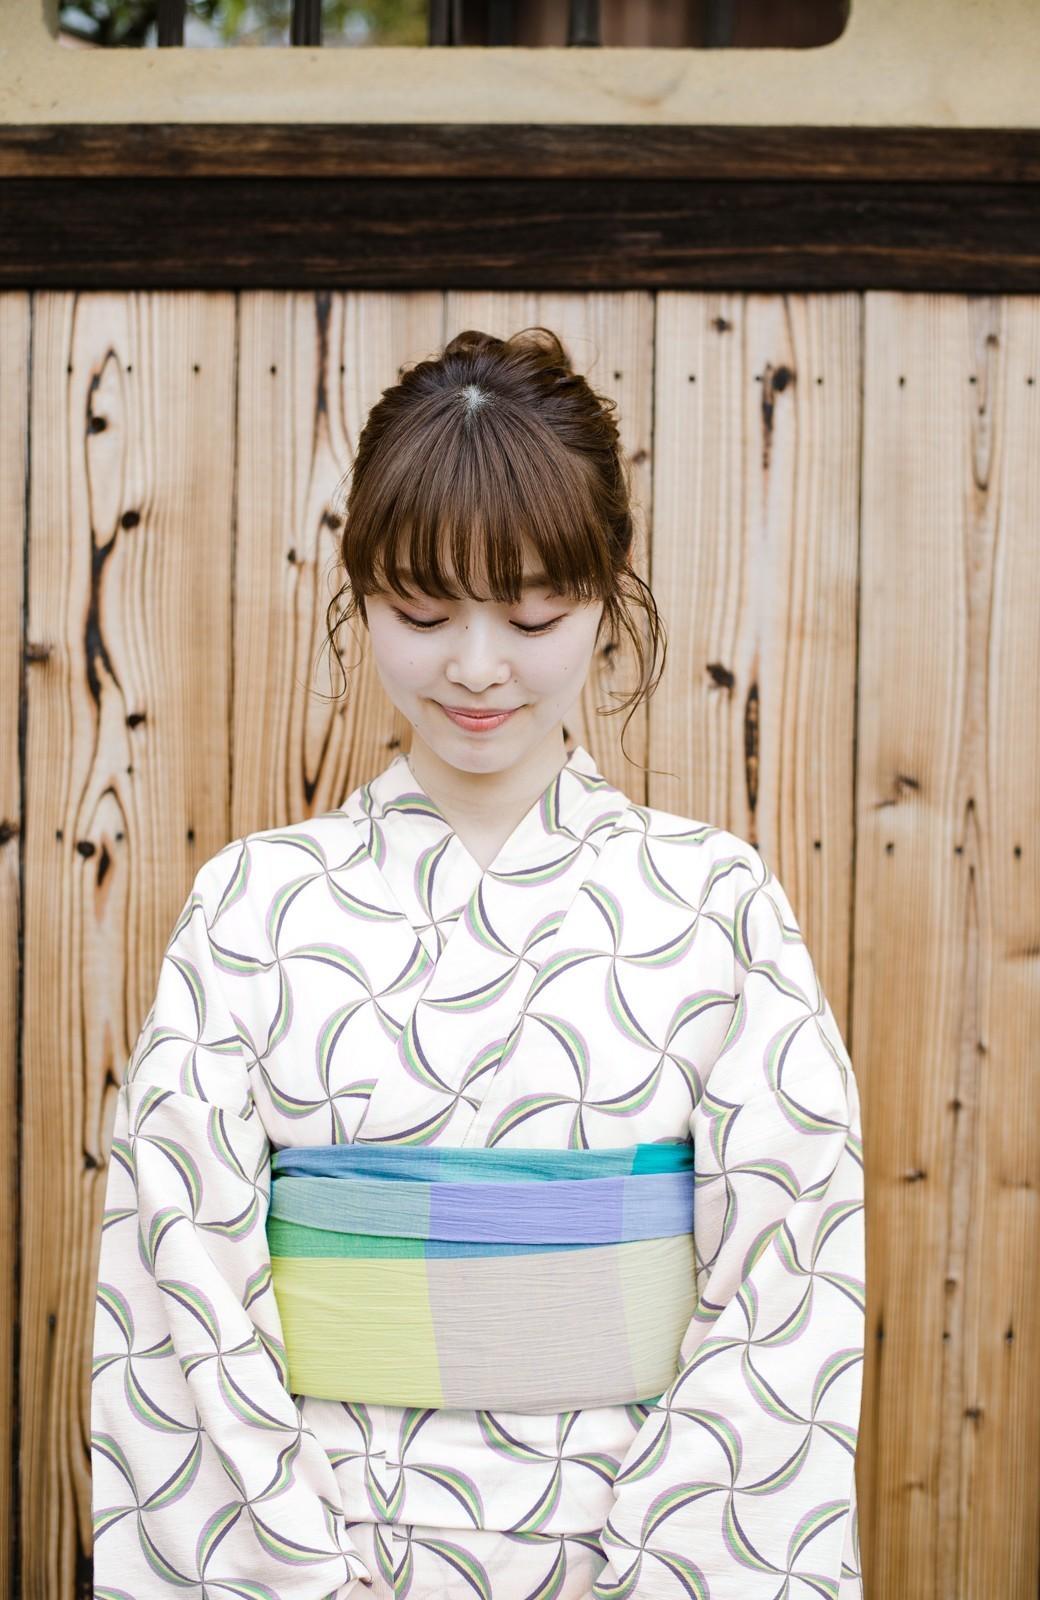 haco! ひでや工房 京都のへこ帯 大格子 <カラフル>の商品写真2